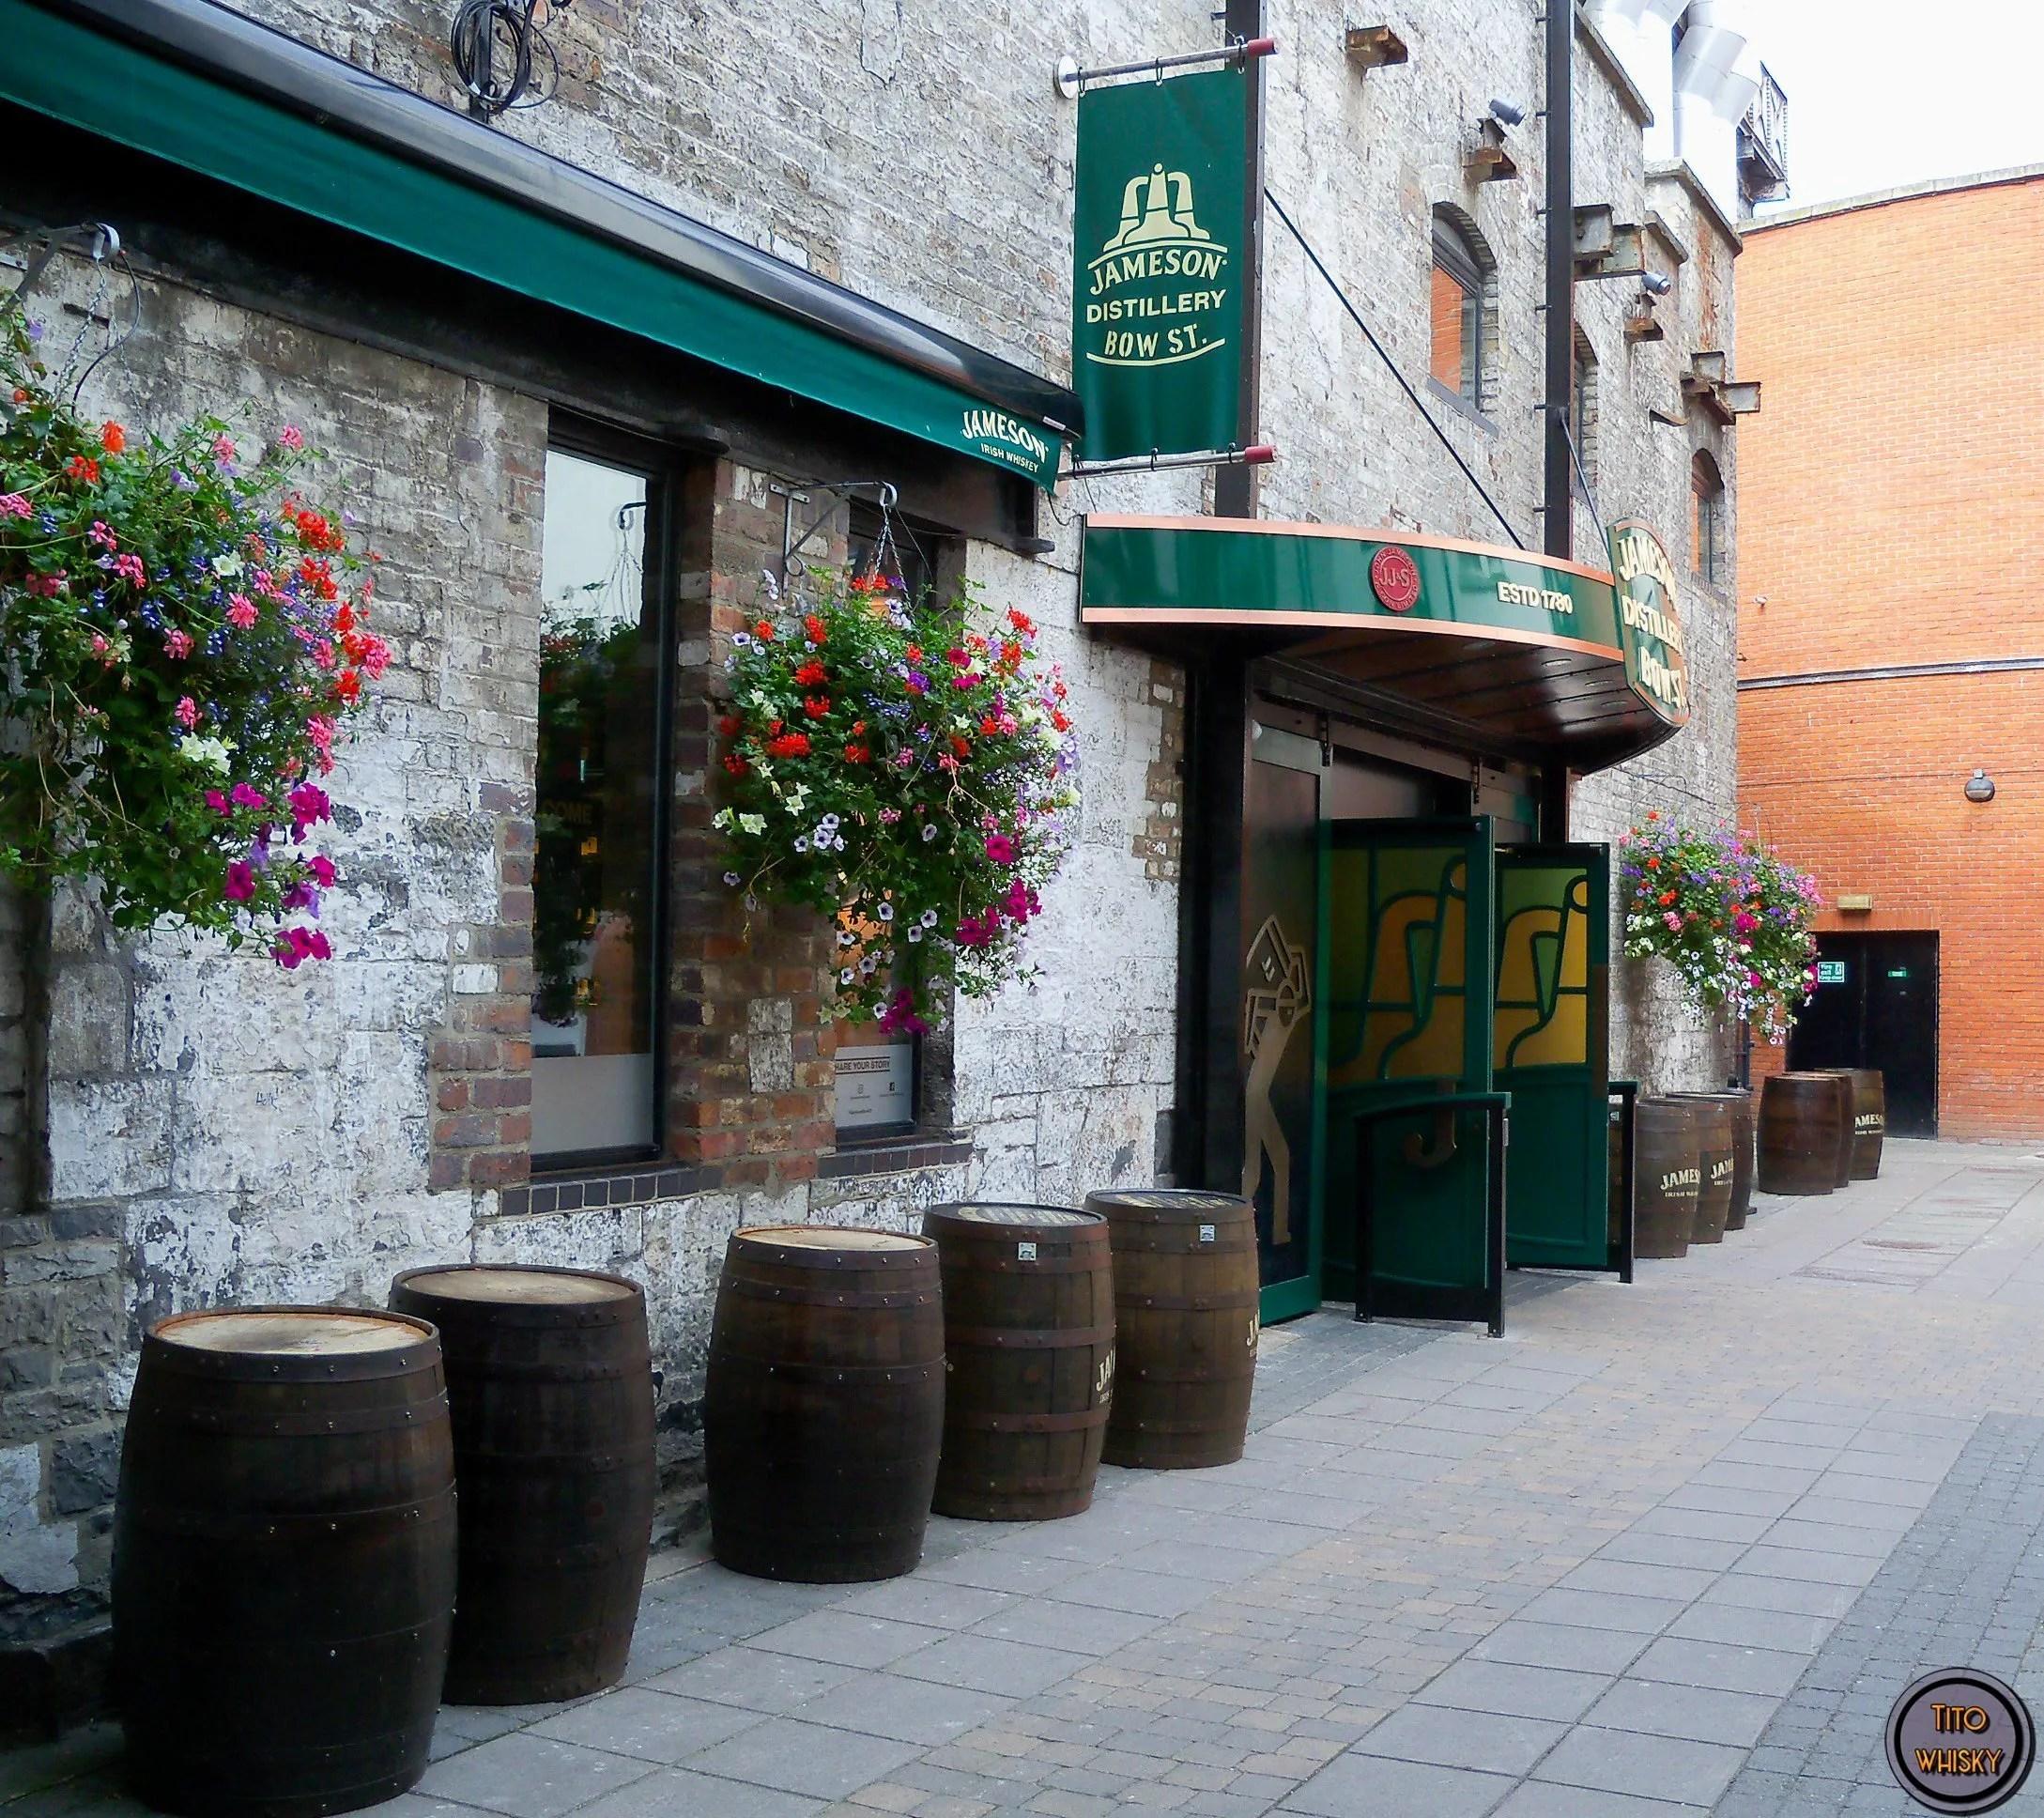 Jameson Bow St.